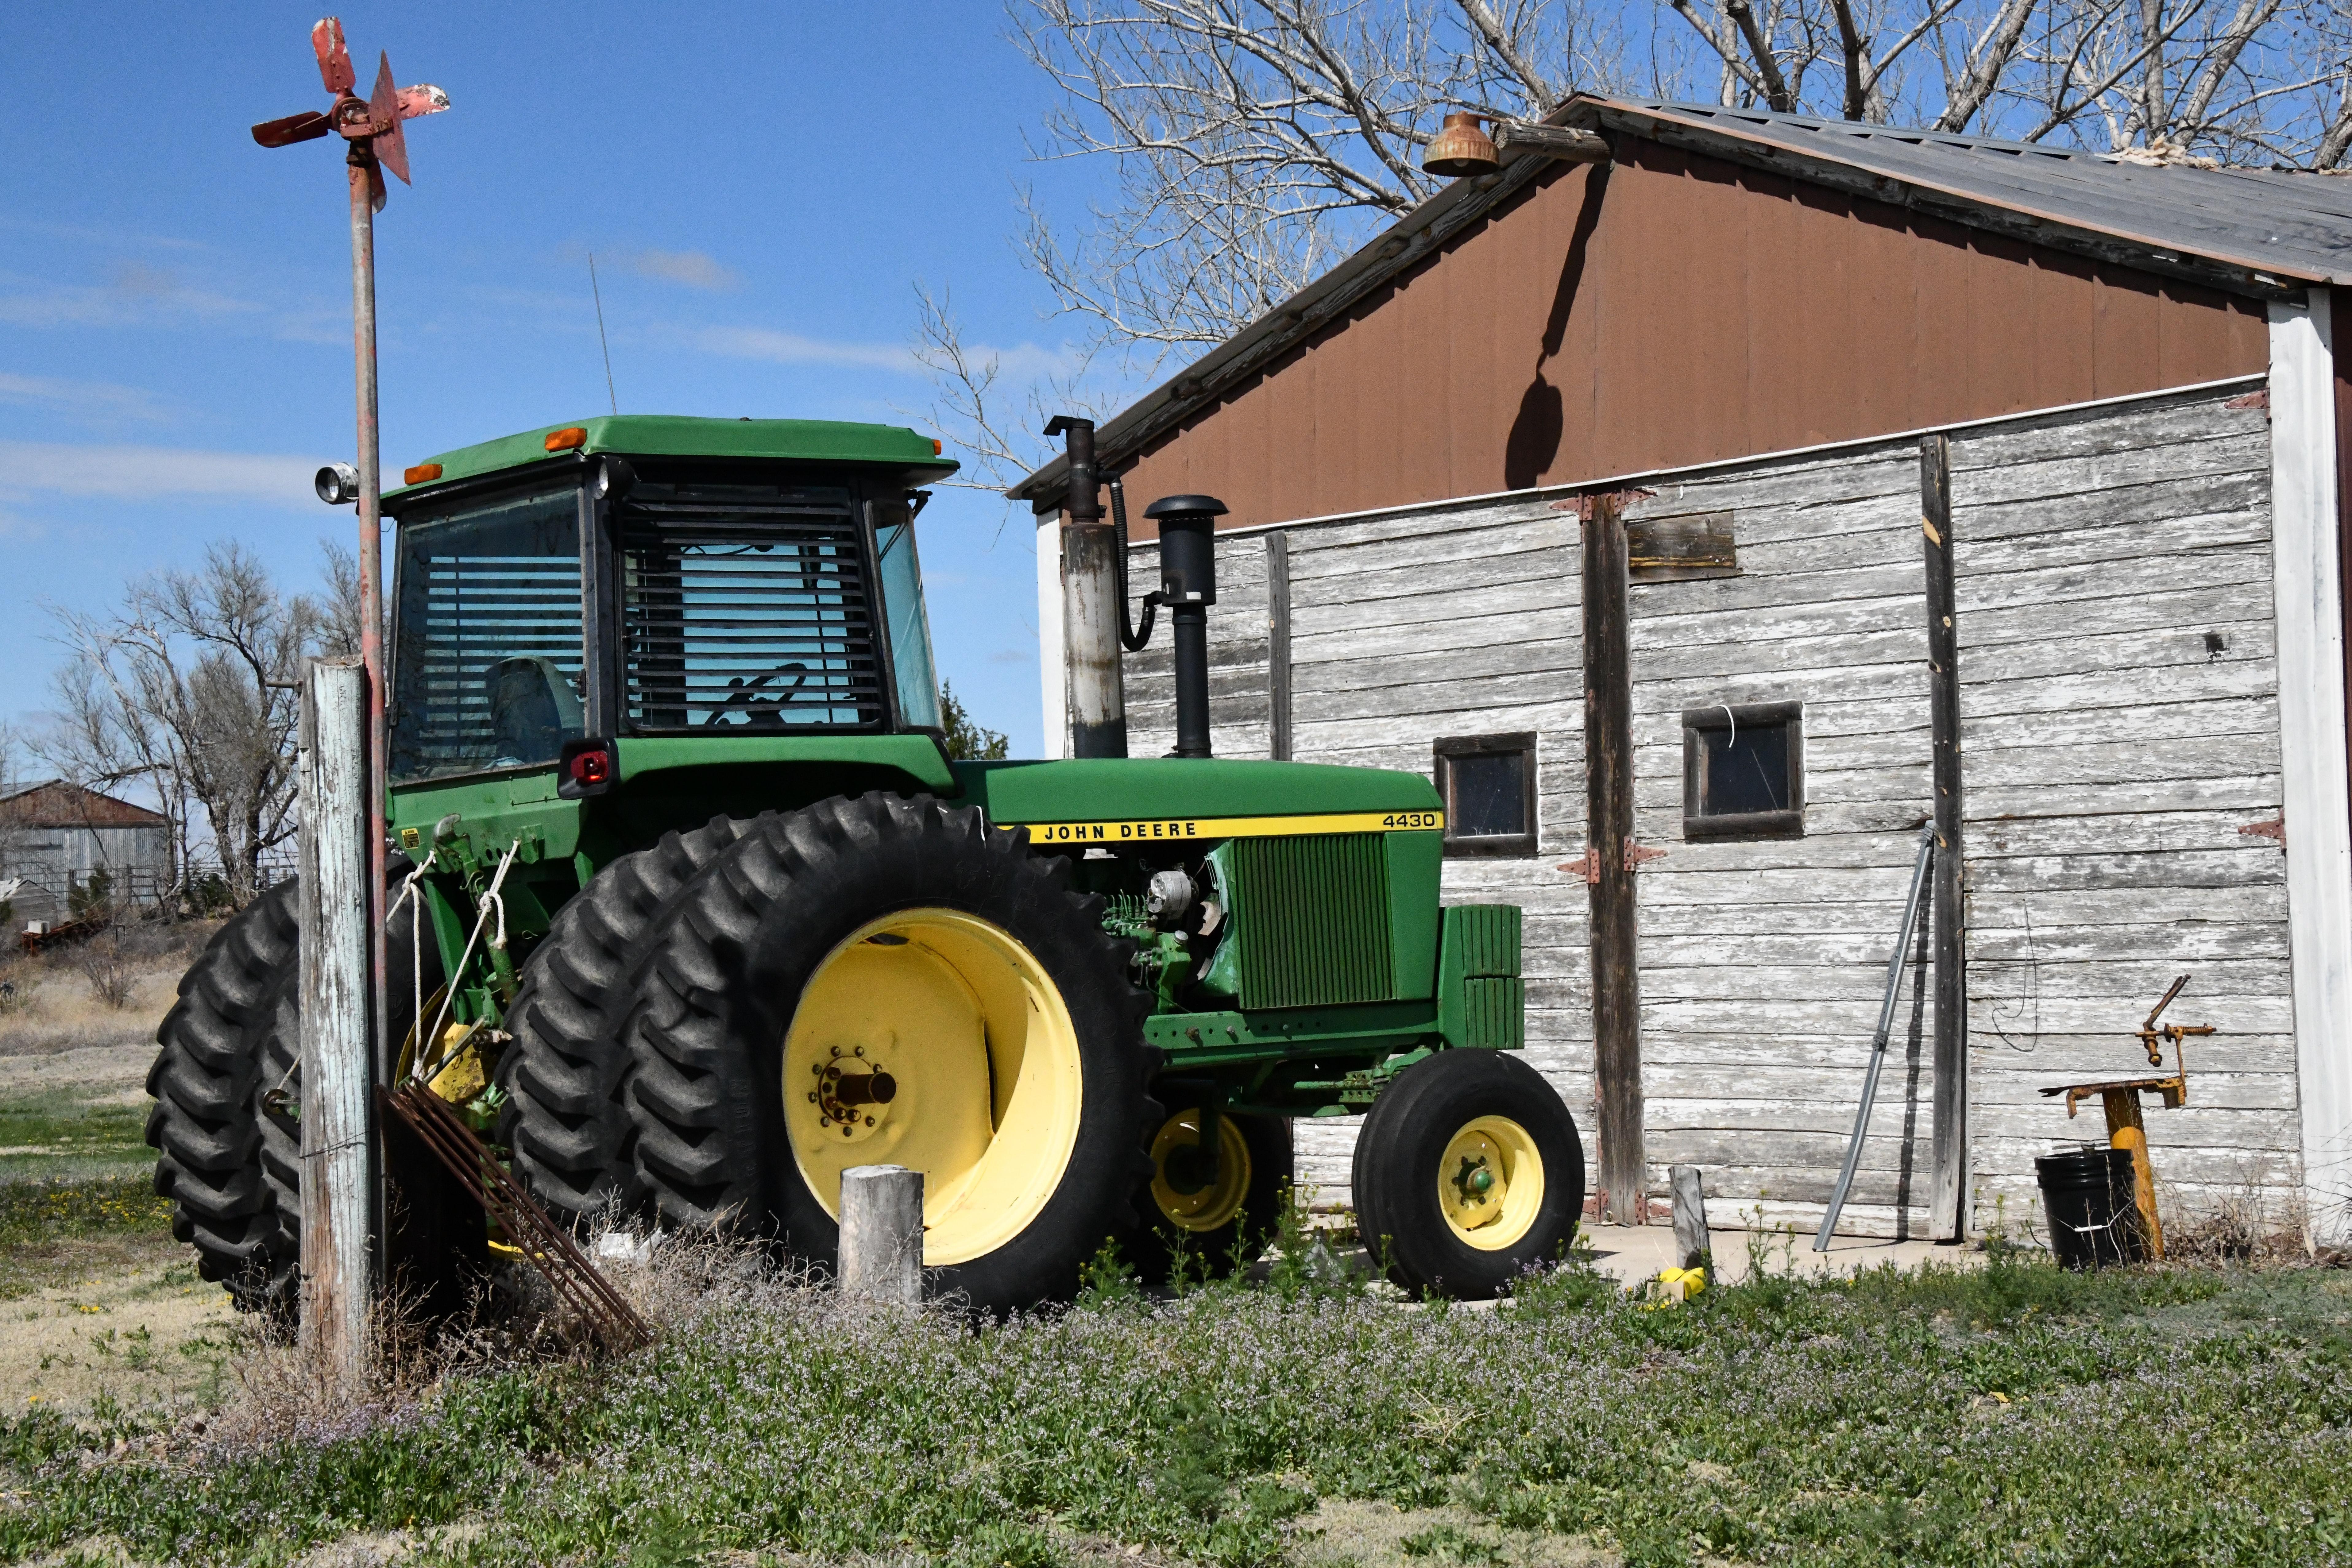 3 Point Landscape Rock Rake Category 1 Tractor Attachment Soil Gravel Lawn